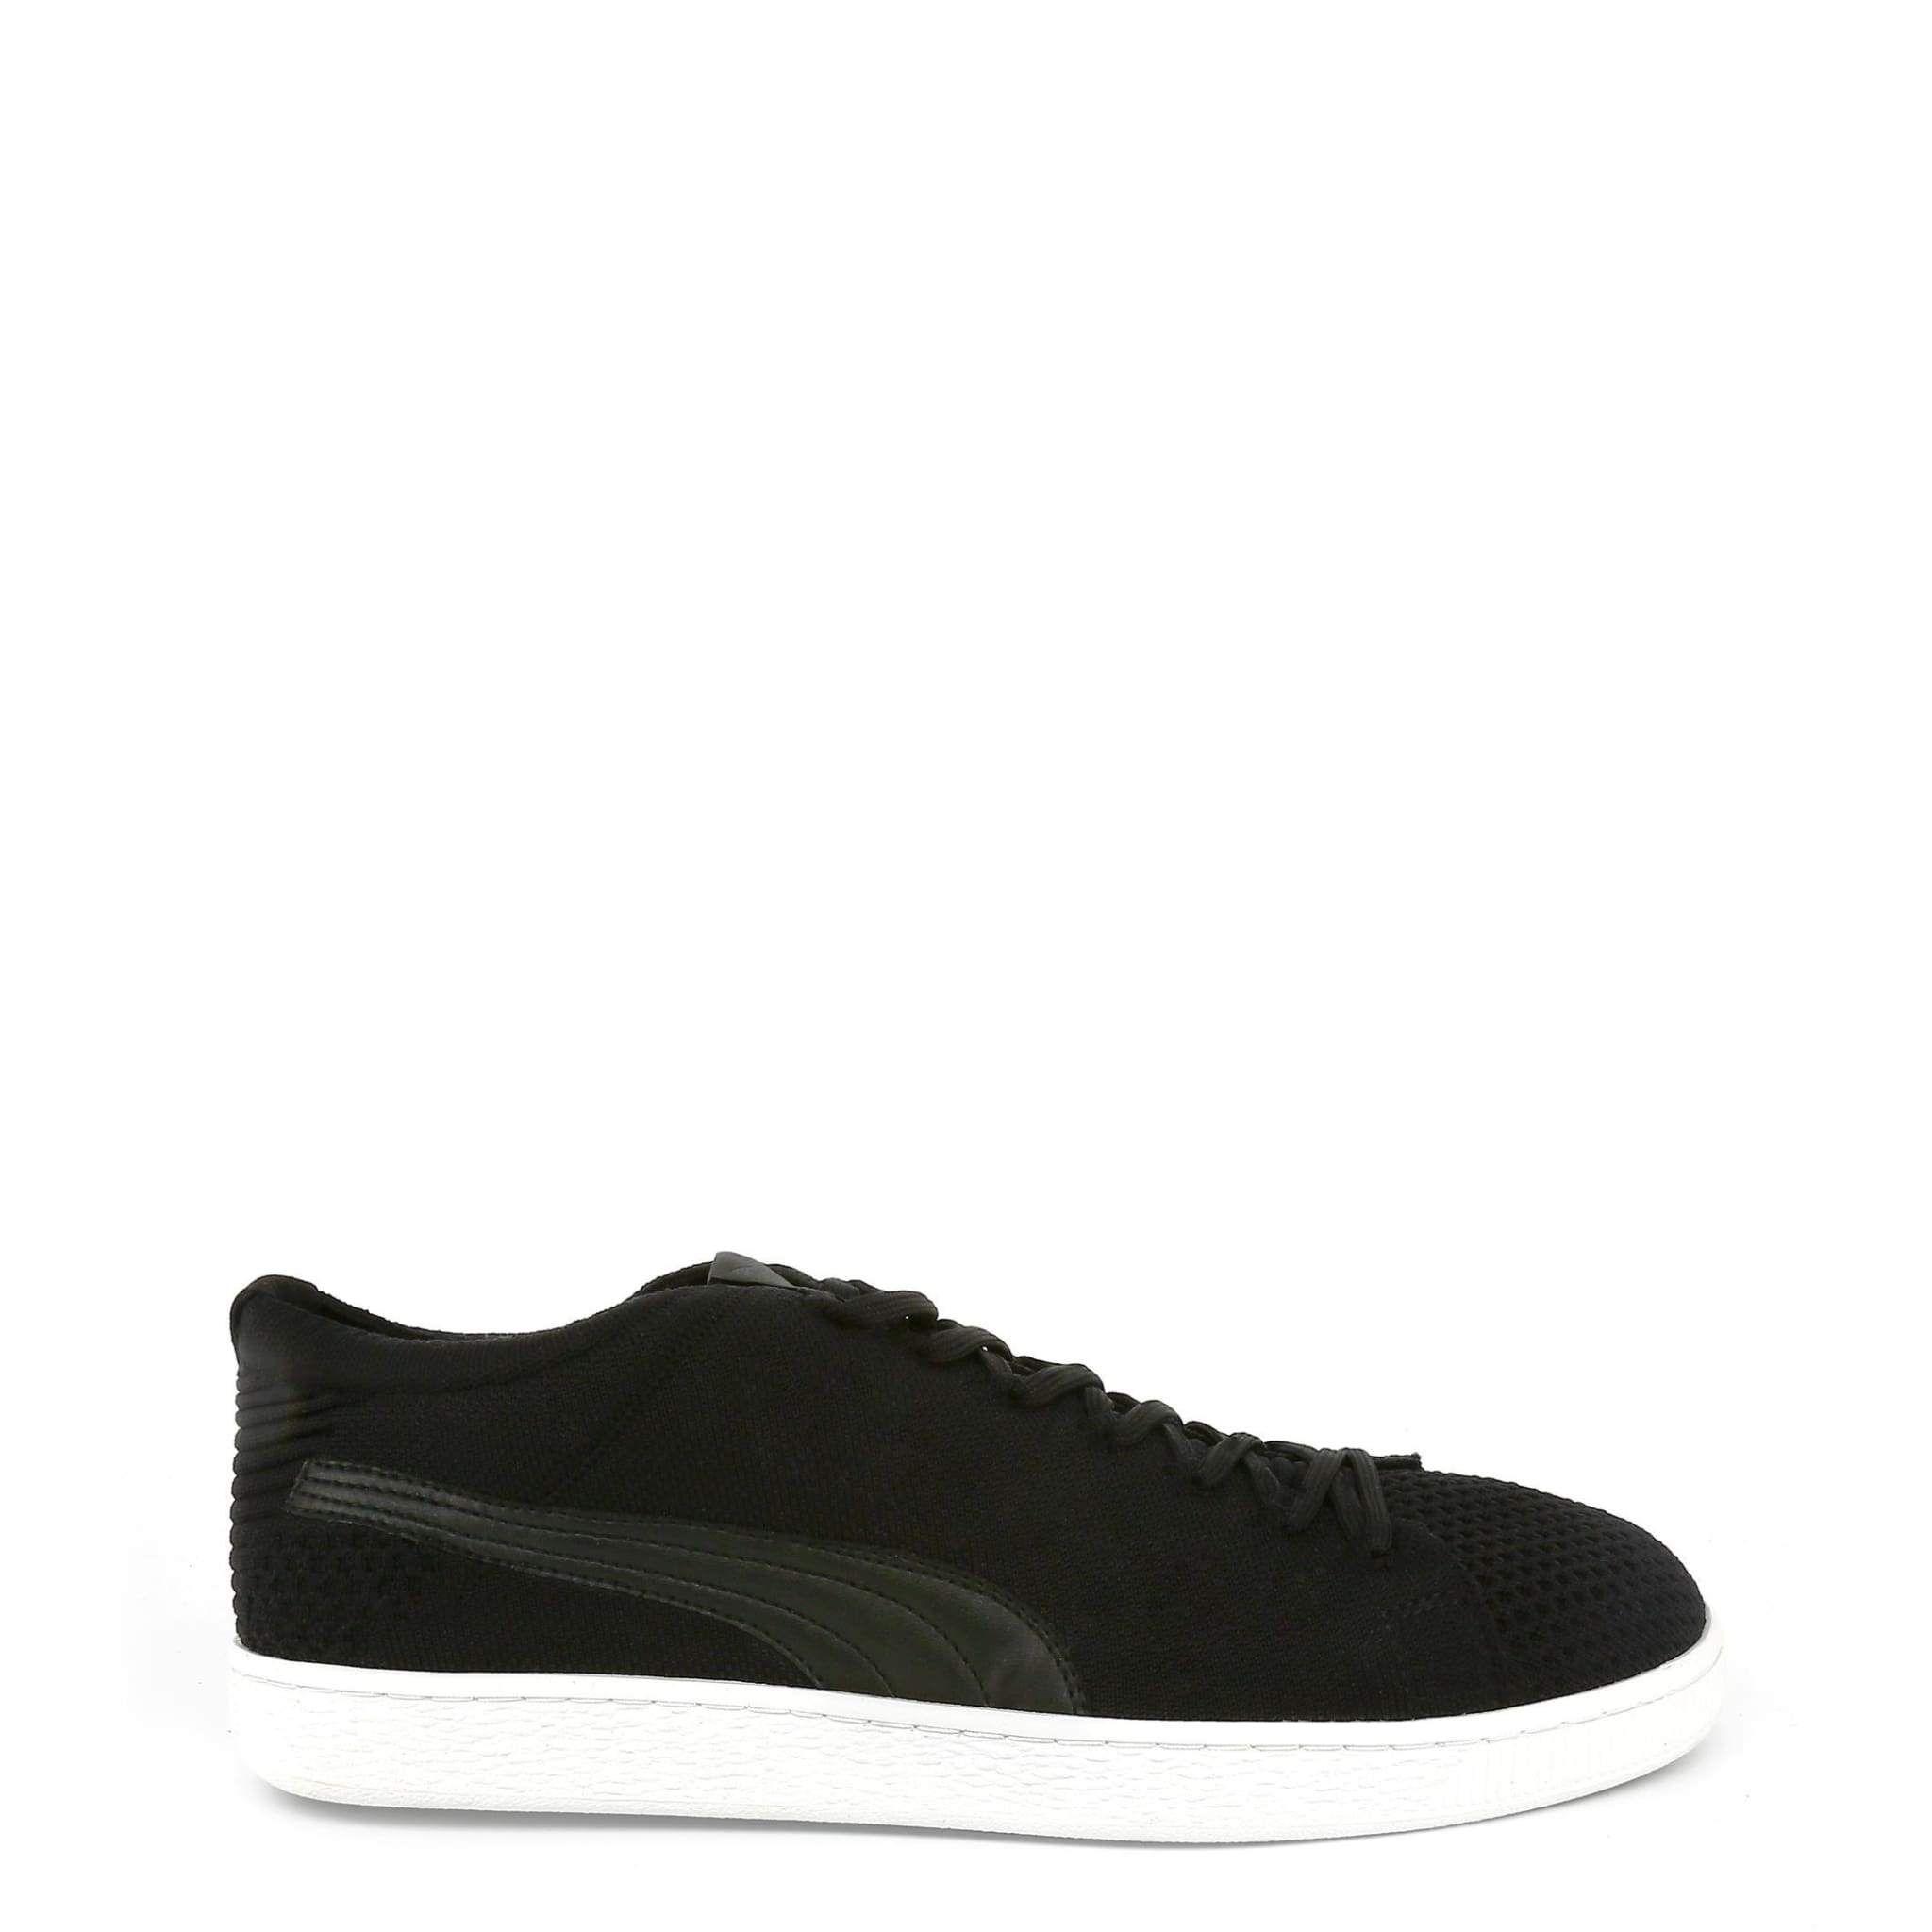 c380eb2cfe37 Puma Basket Men Black Sneakers